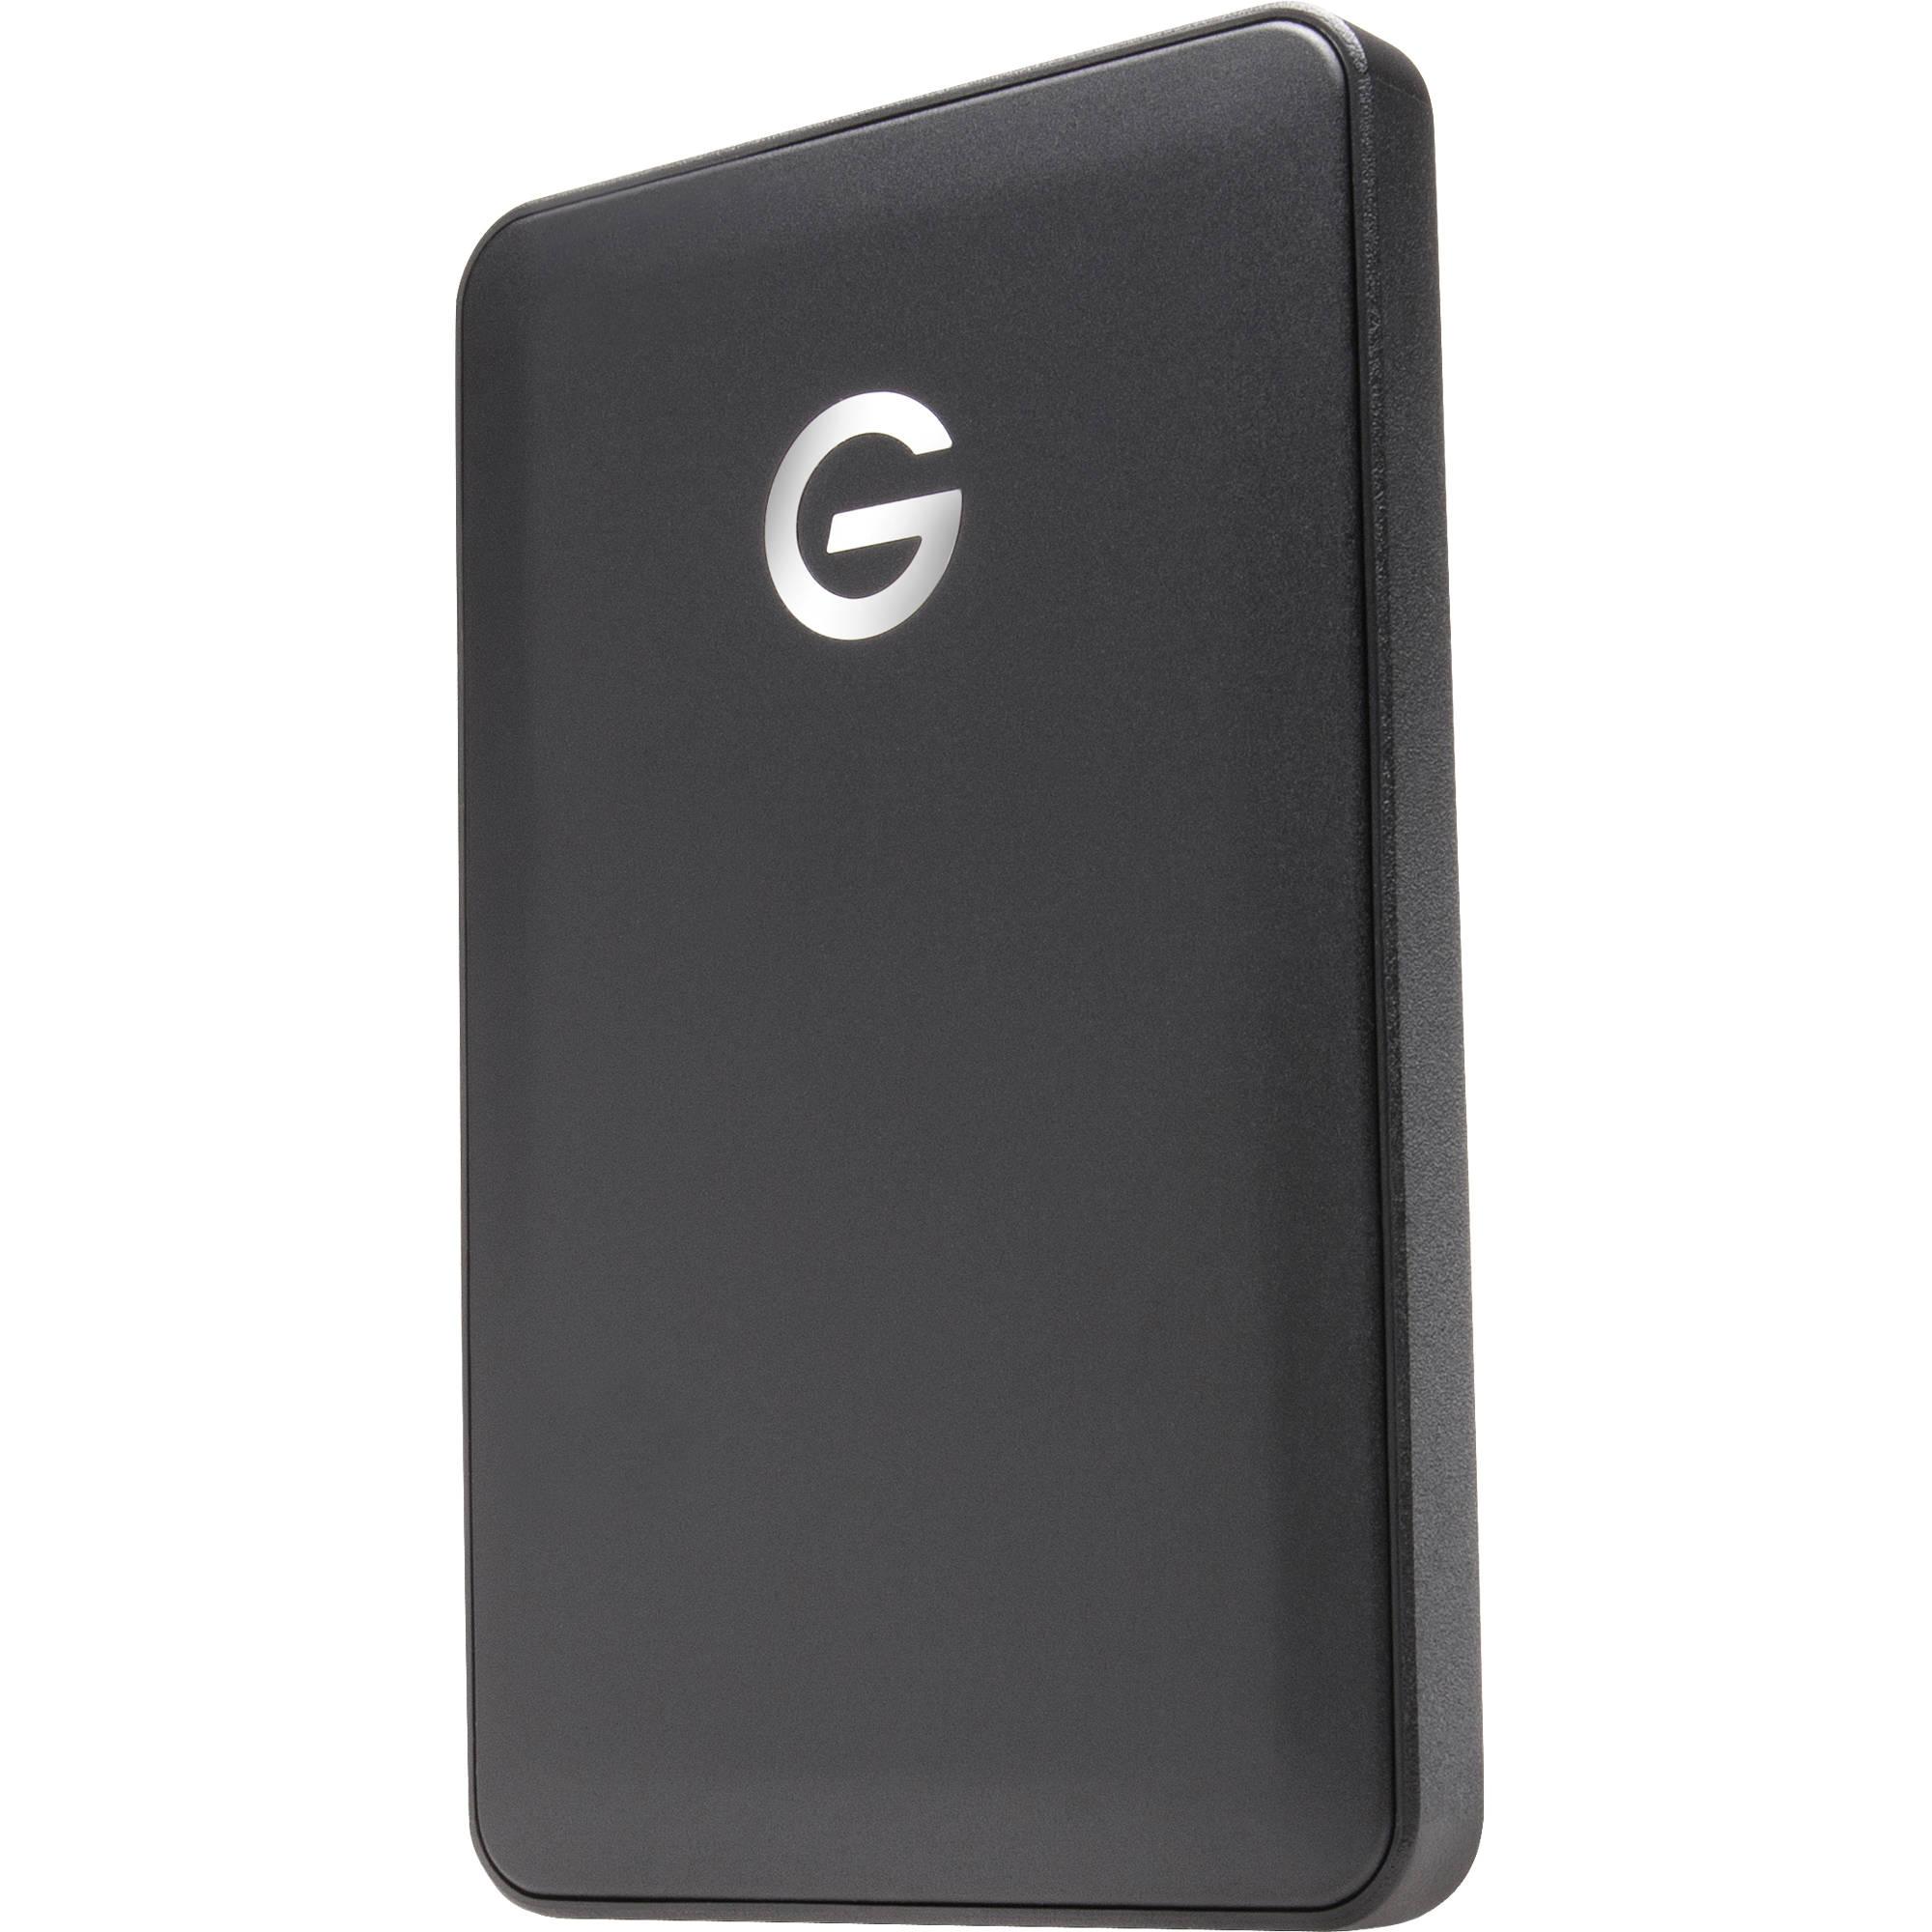 external technology best drive silver tech type c g rd macbook site toaster pro usb hard shop buy